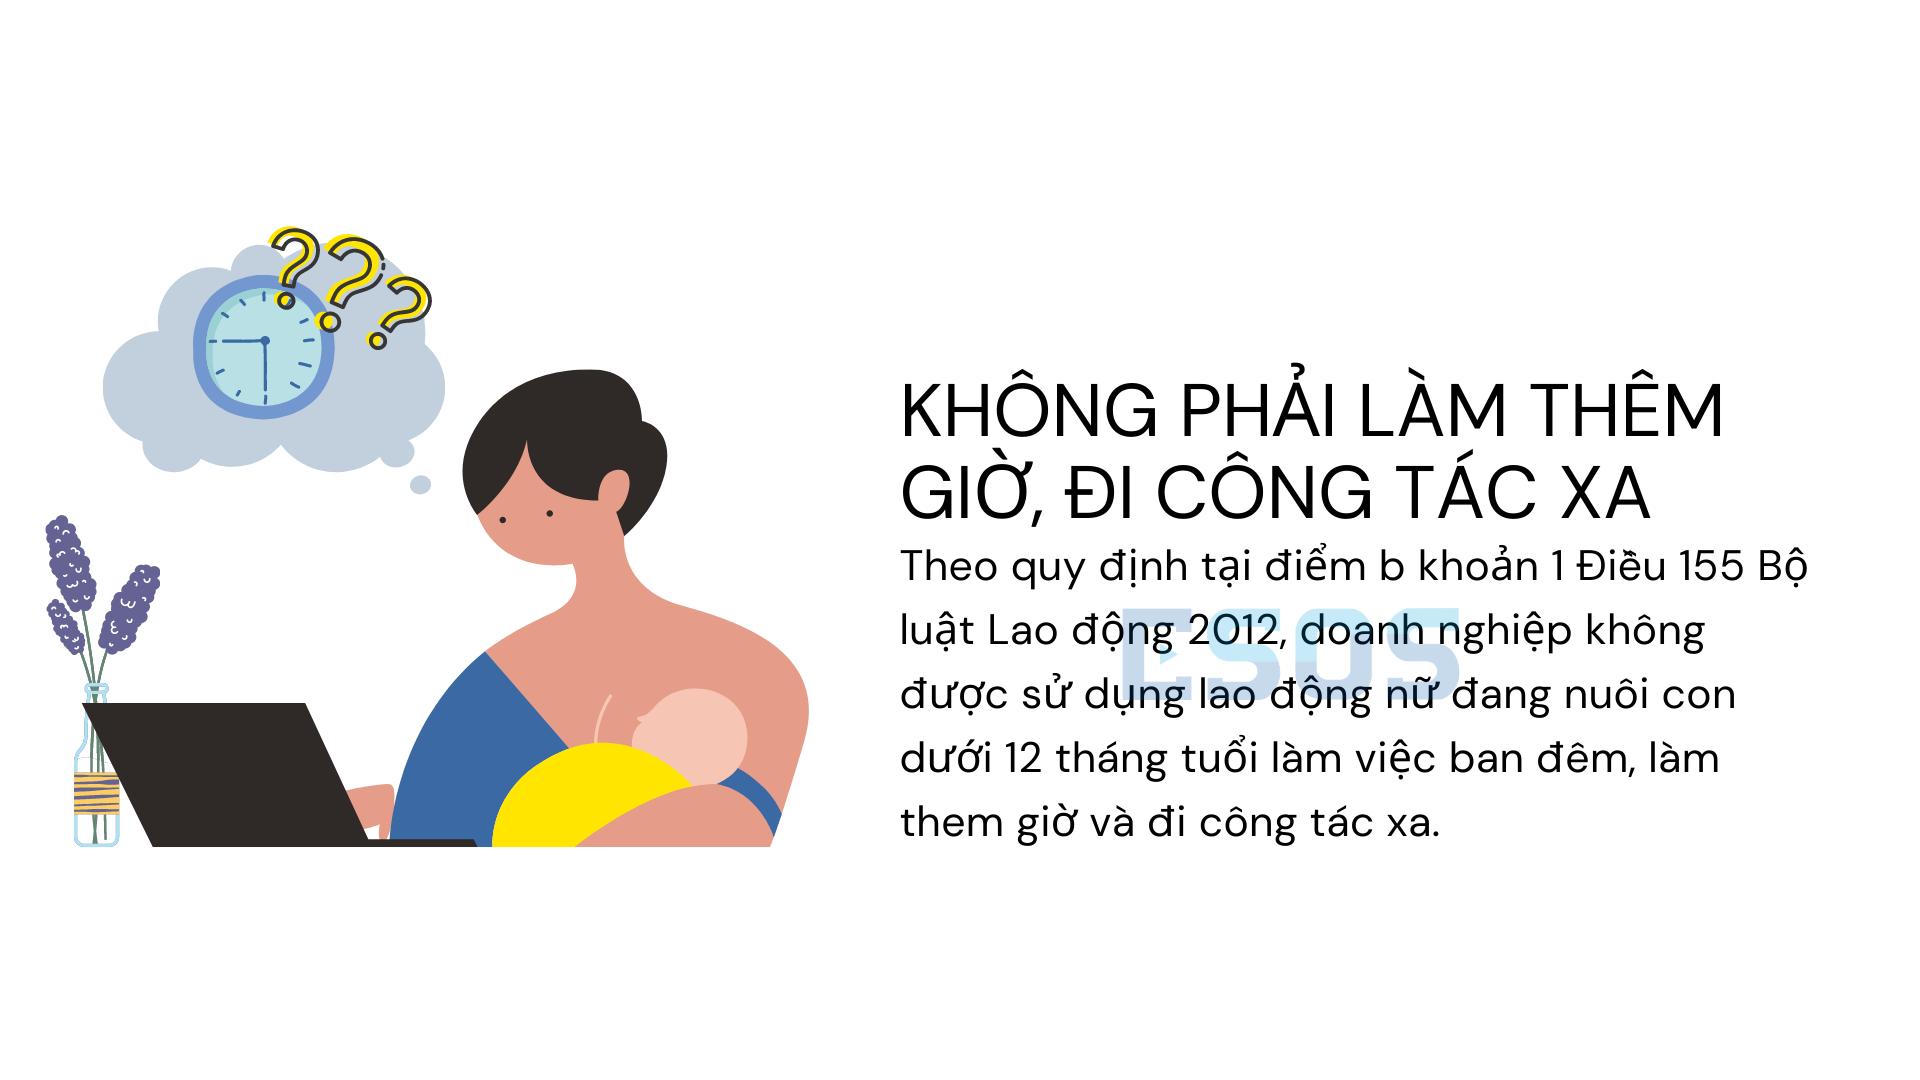 Nhung-quyen-loi-thai-san-ma-lao-dong-nu-can-biet-ESOS-Payroll-Vietnam